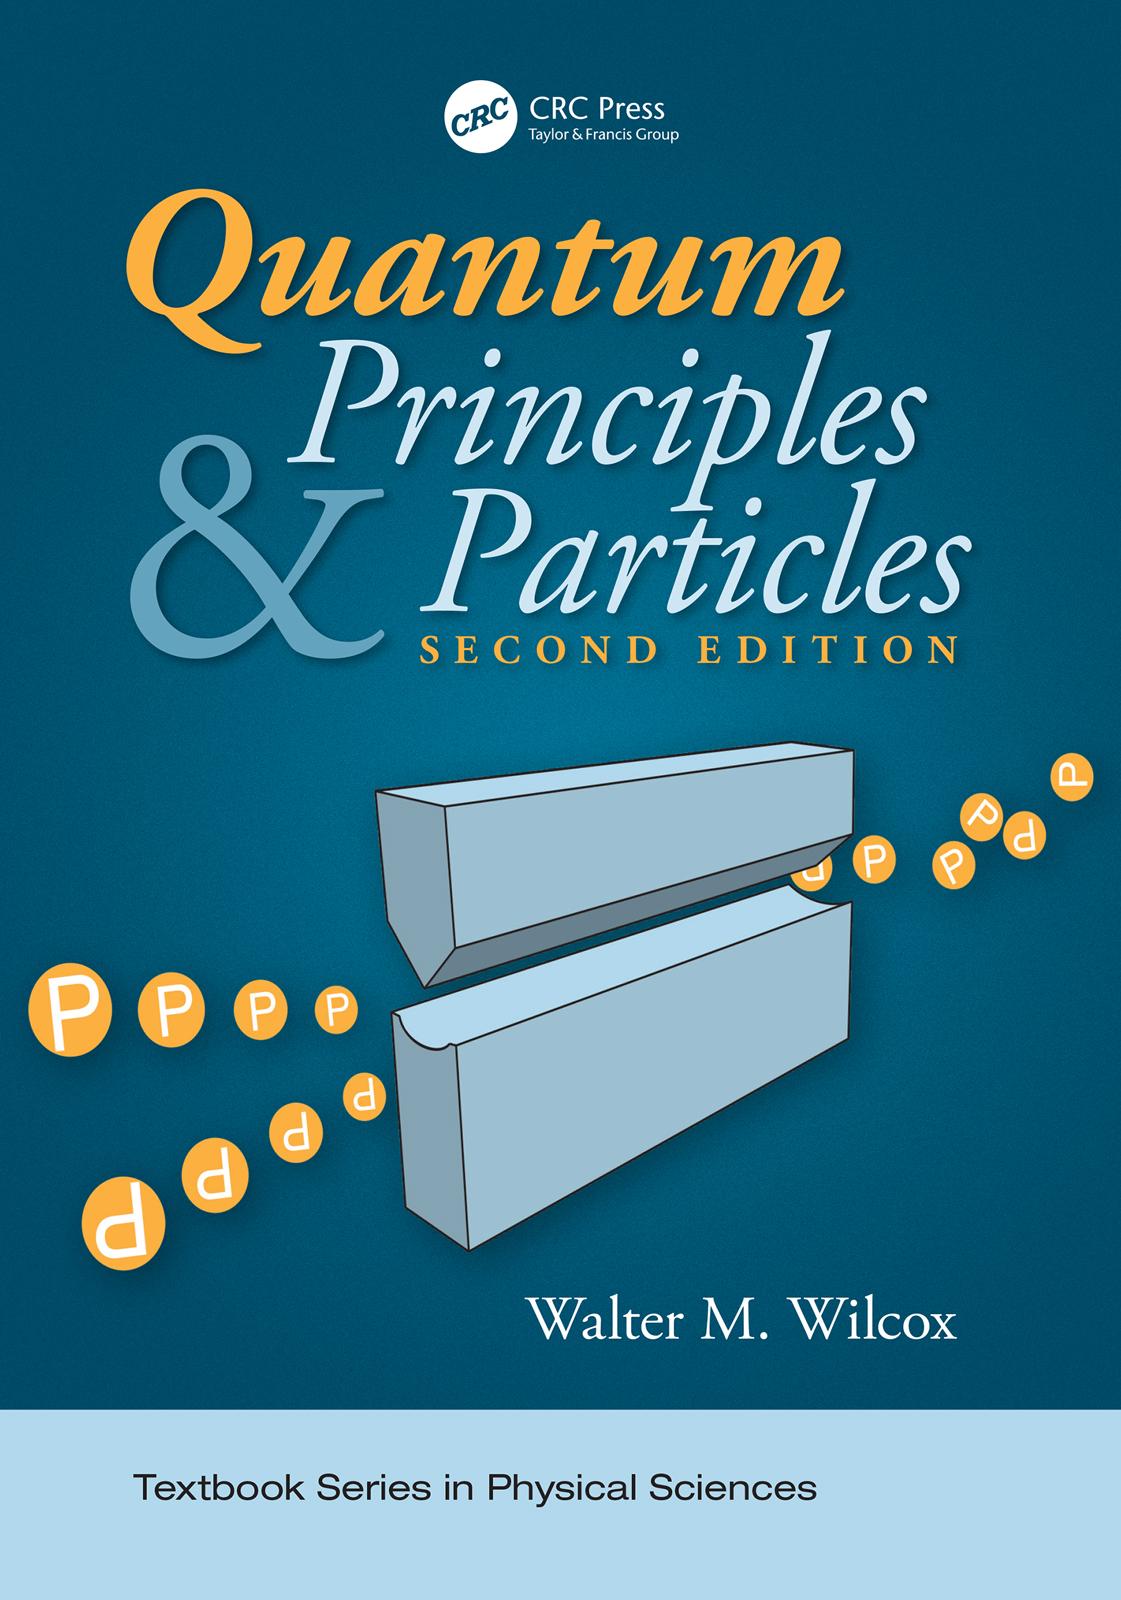 Quantum Principles and Particles, Second Edition